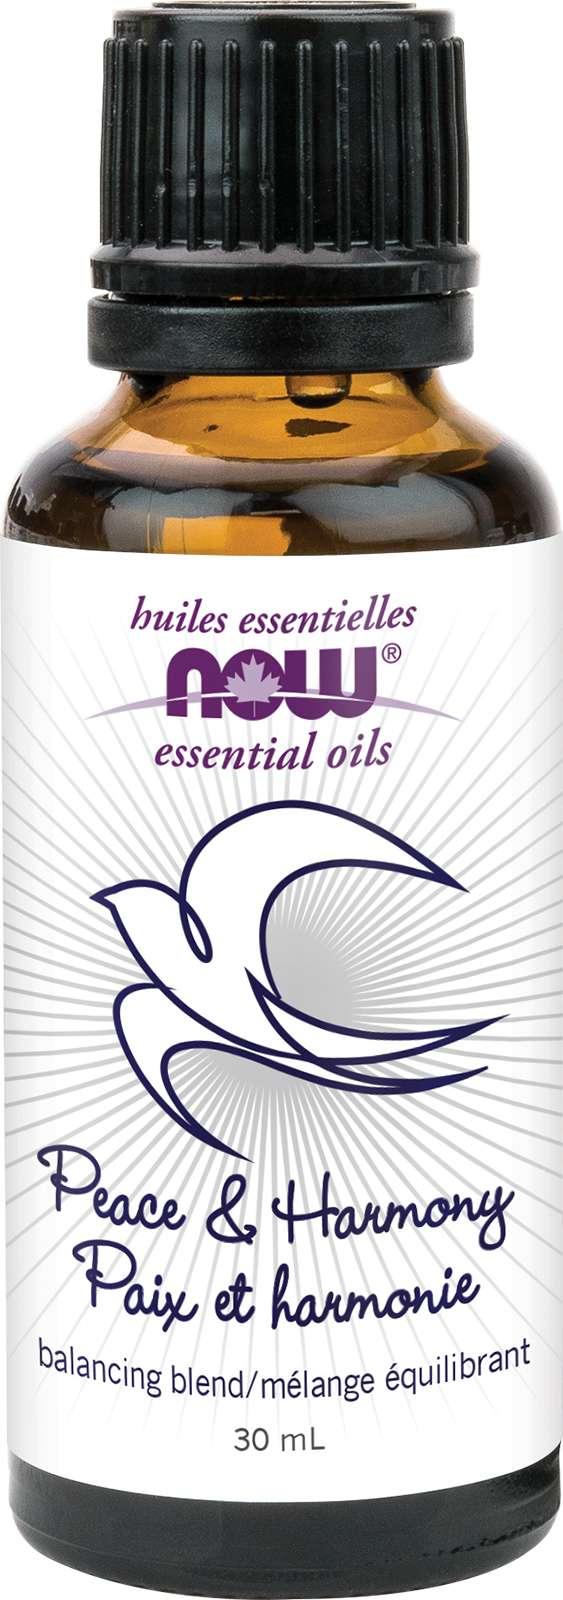 Peace & Harmony Essential Oil Blend 30mL